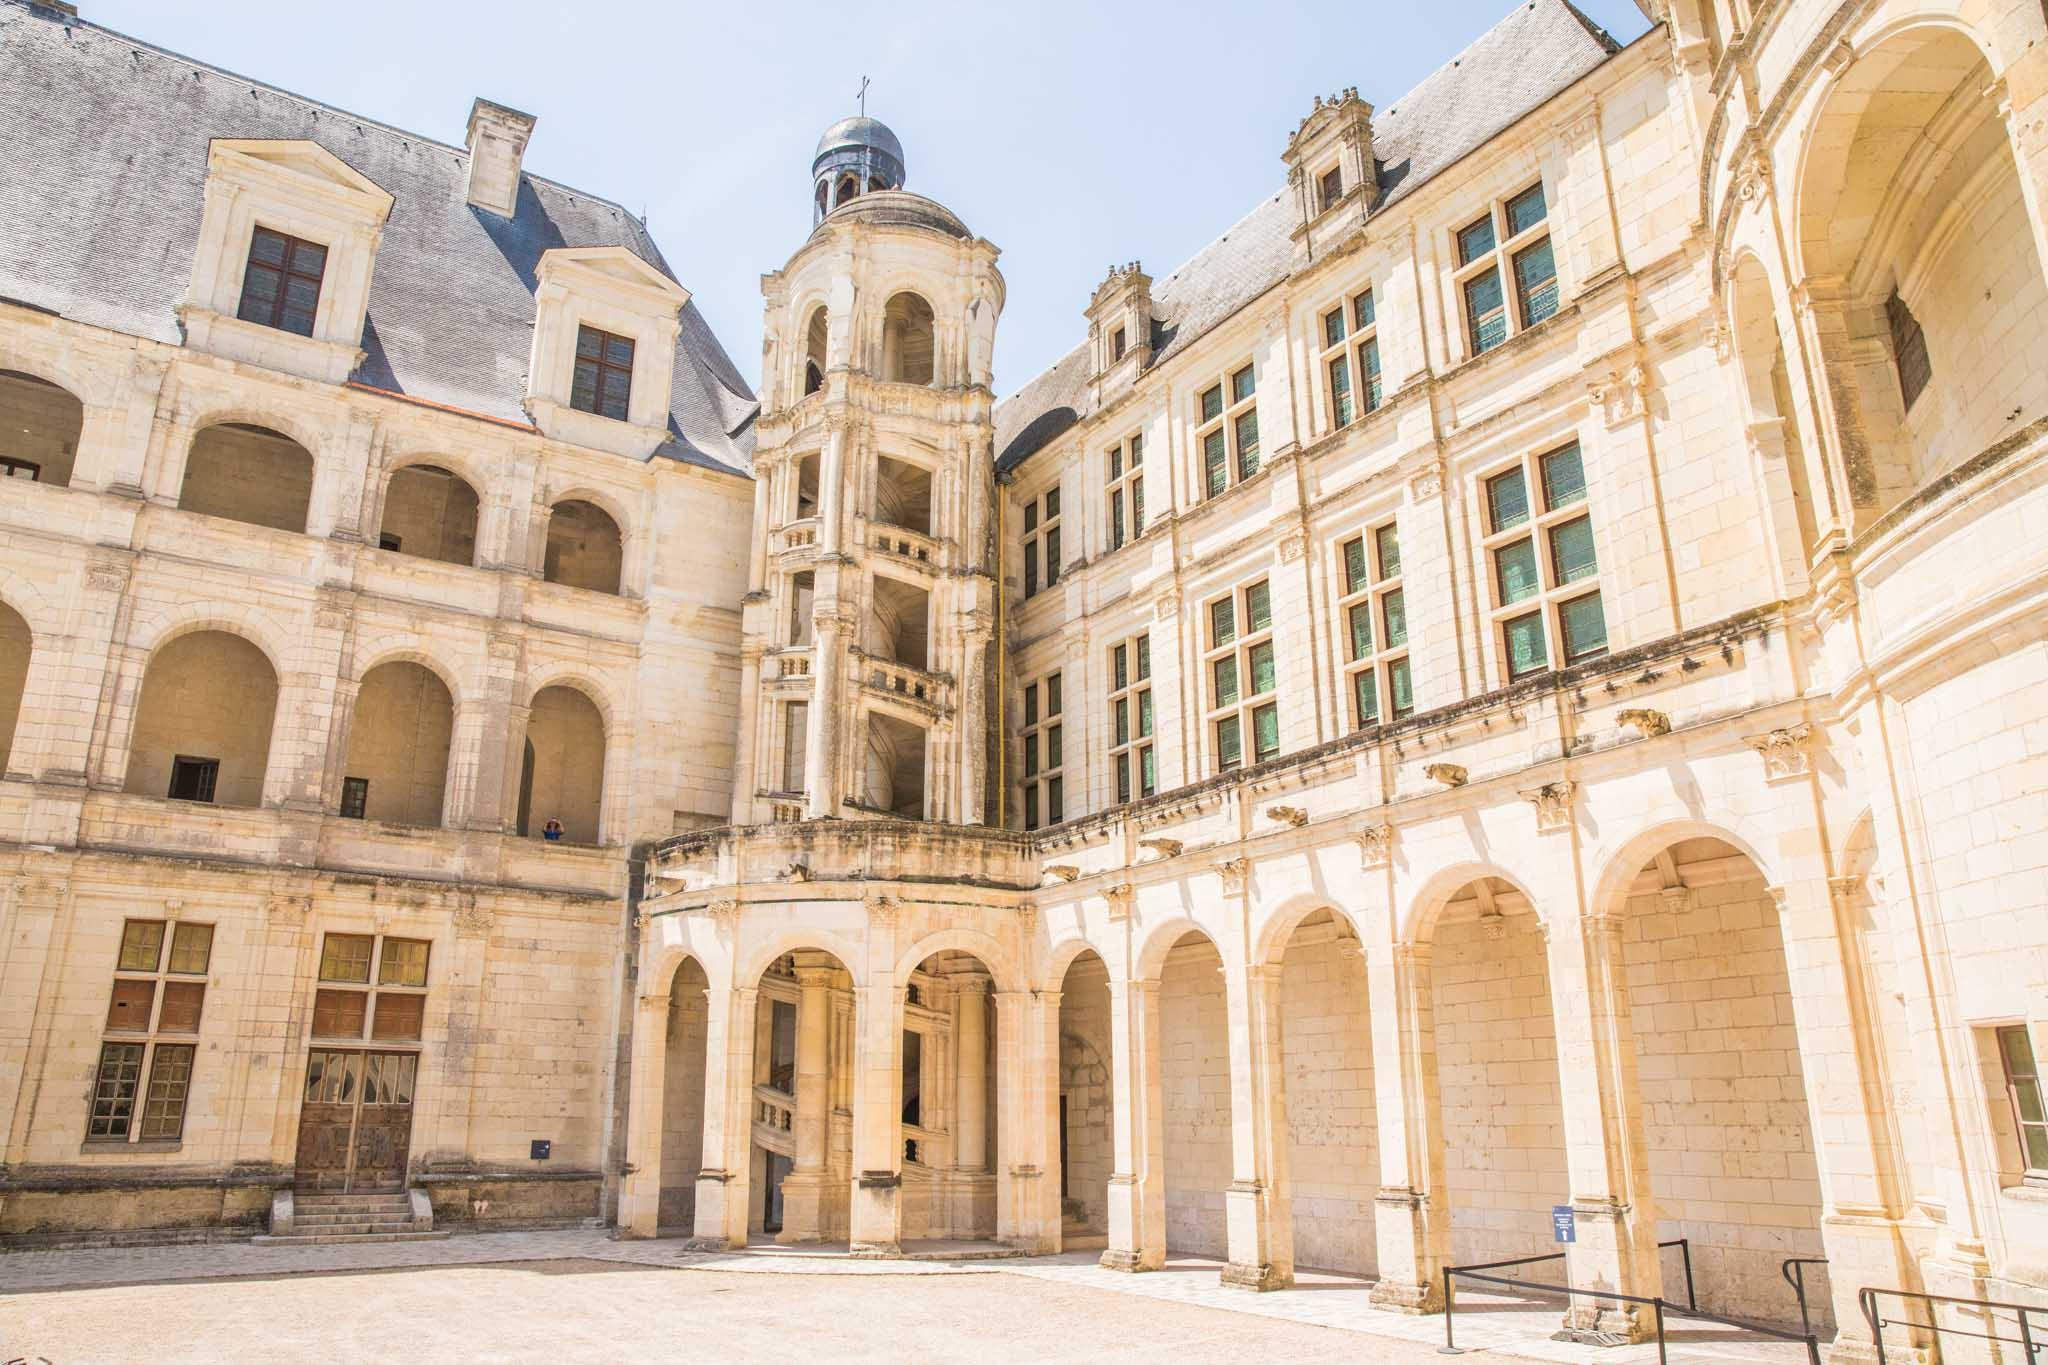 Chambord Chateau (Castle) - 2017 (7 of 66)